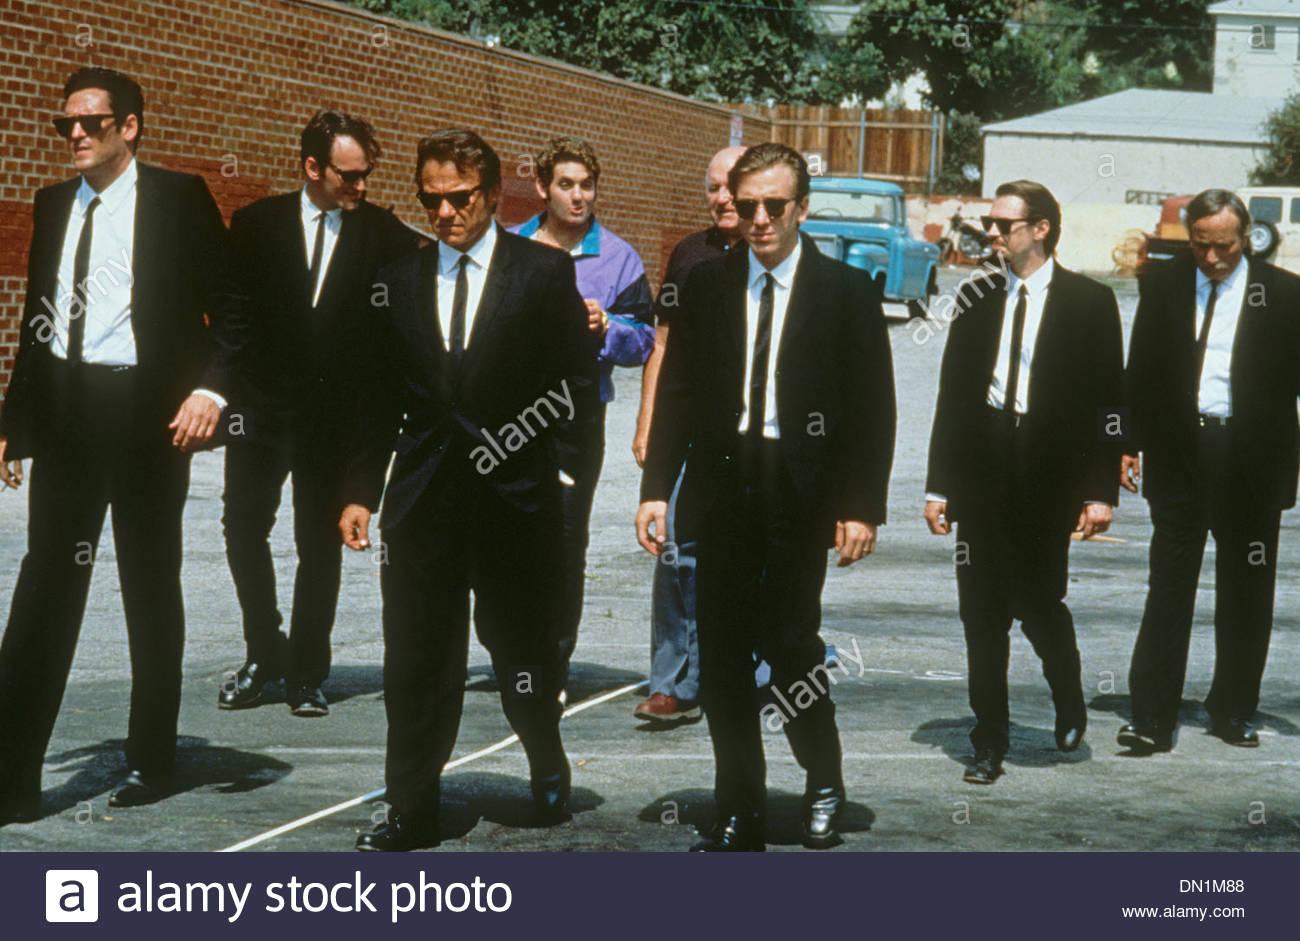 RESERVOIR DOGS 1992 Miramax Films production - Stock Image